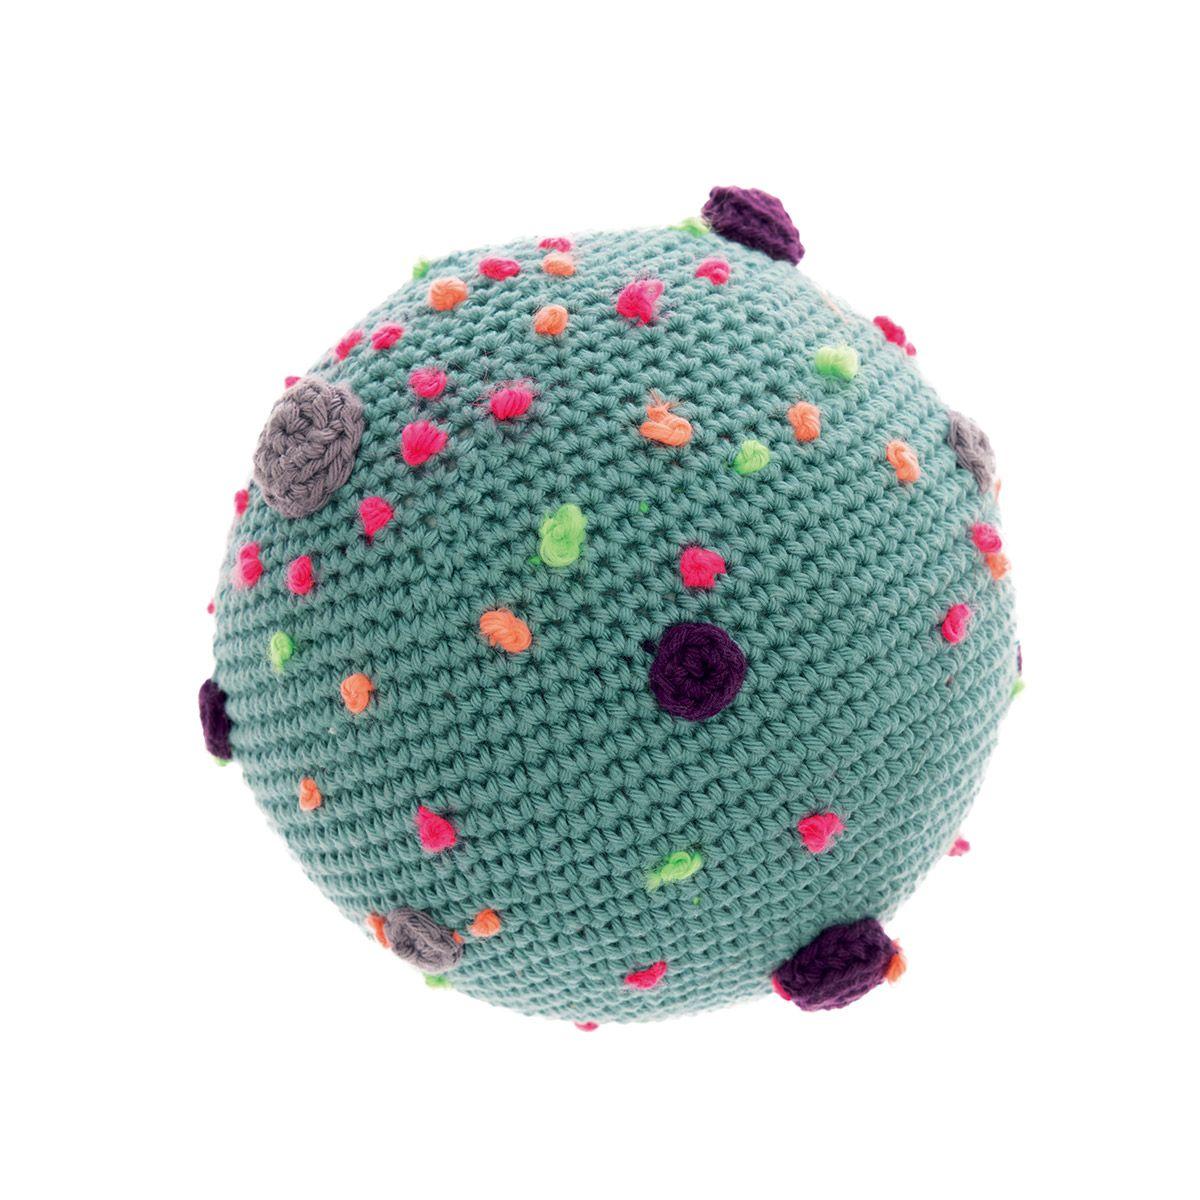 Kit crochet amigurumi - Planète néon